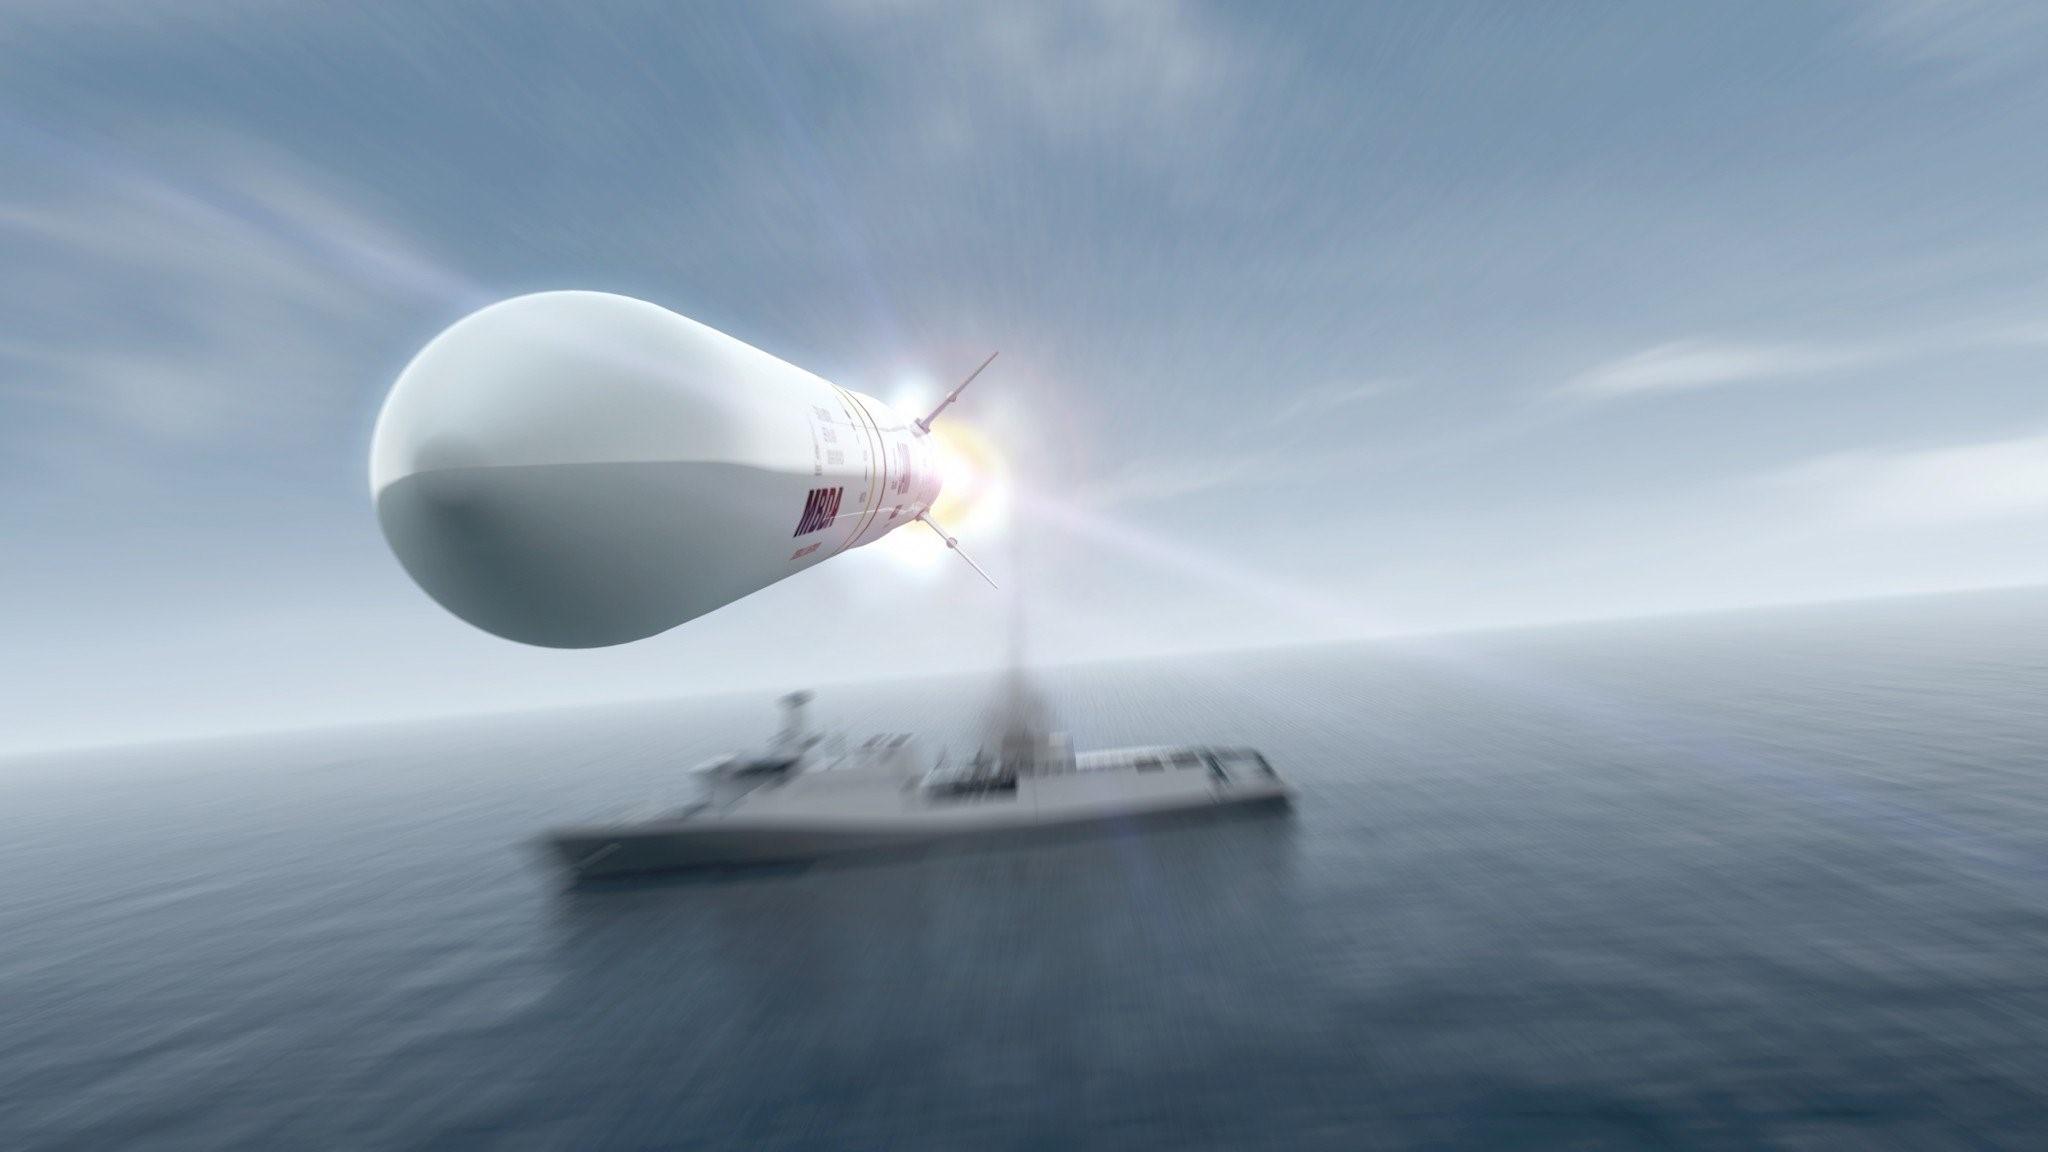 Гиперзвуковая ракета ВКС РФ «Циркон»